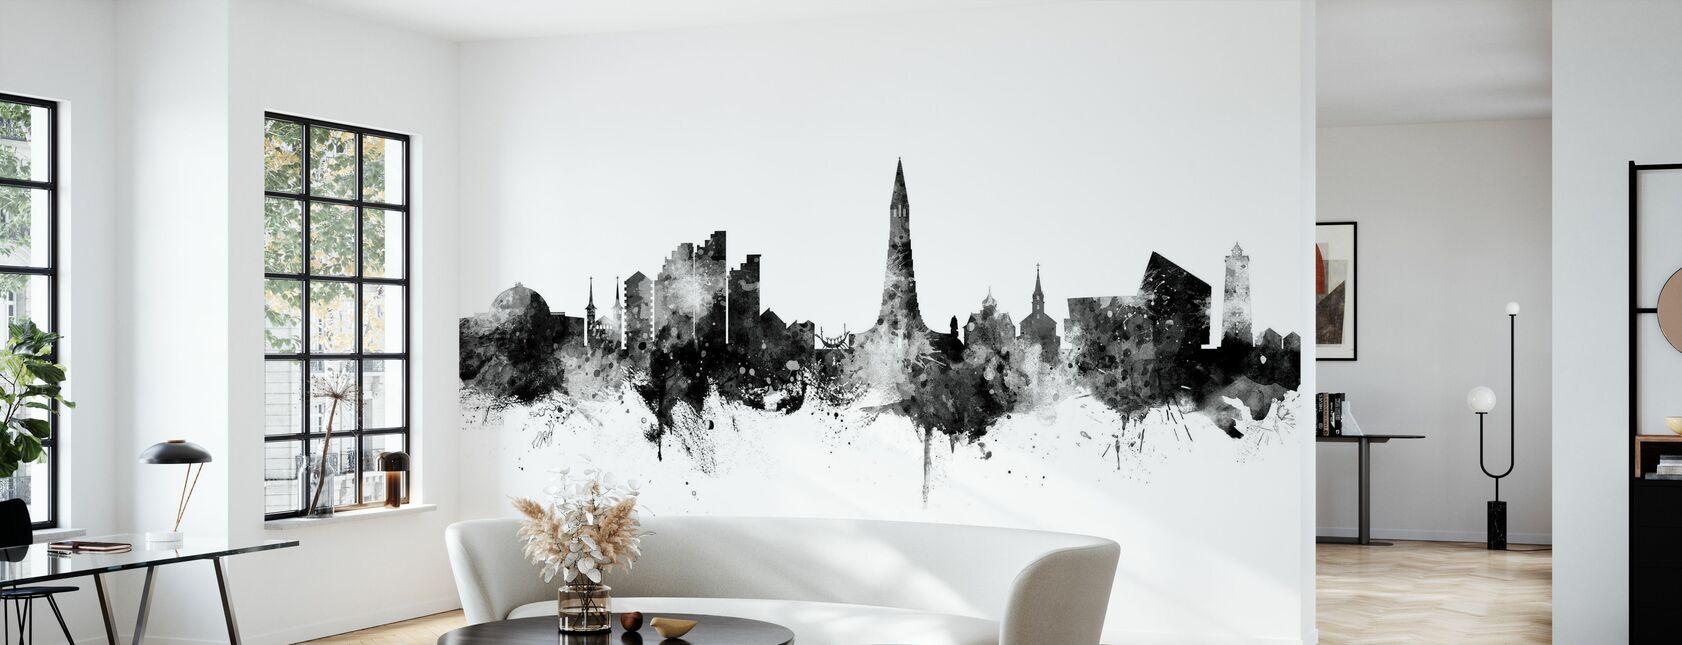 Reykjavik Iceland Skyline - Wallpaper - Living Room